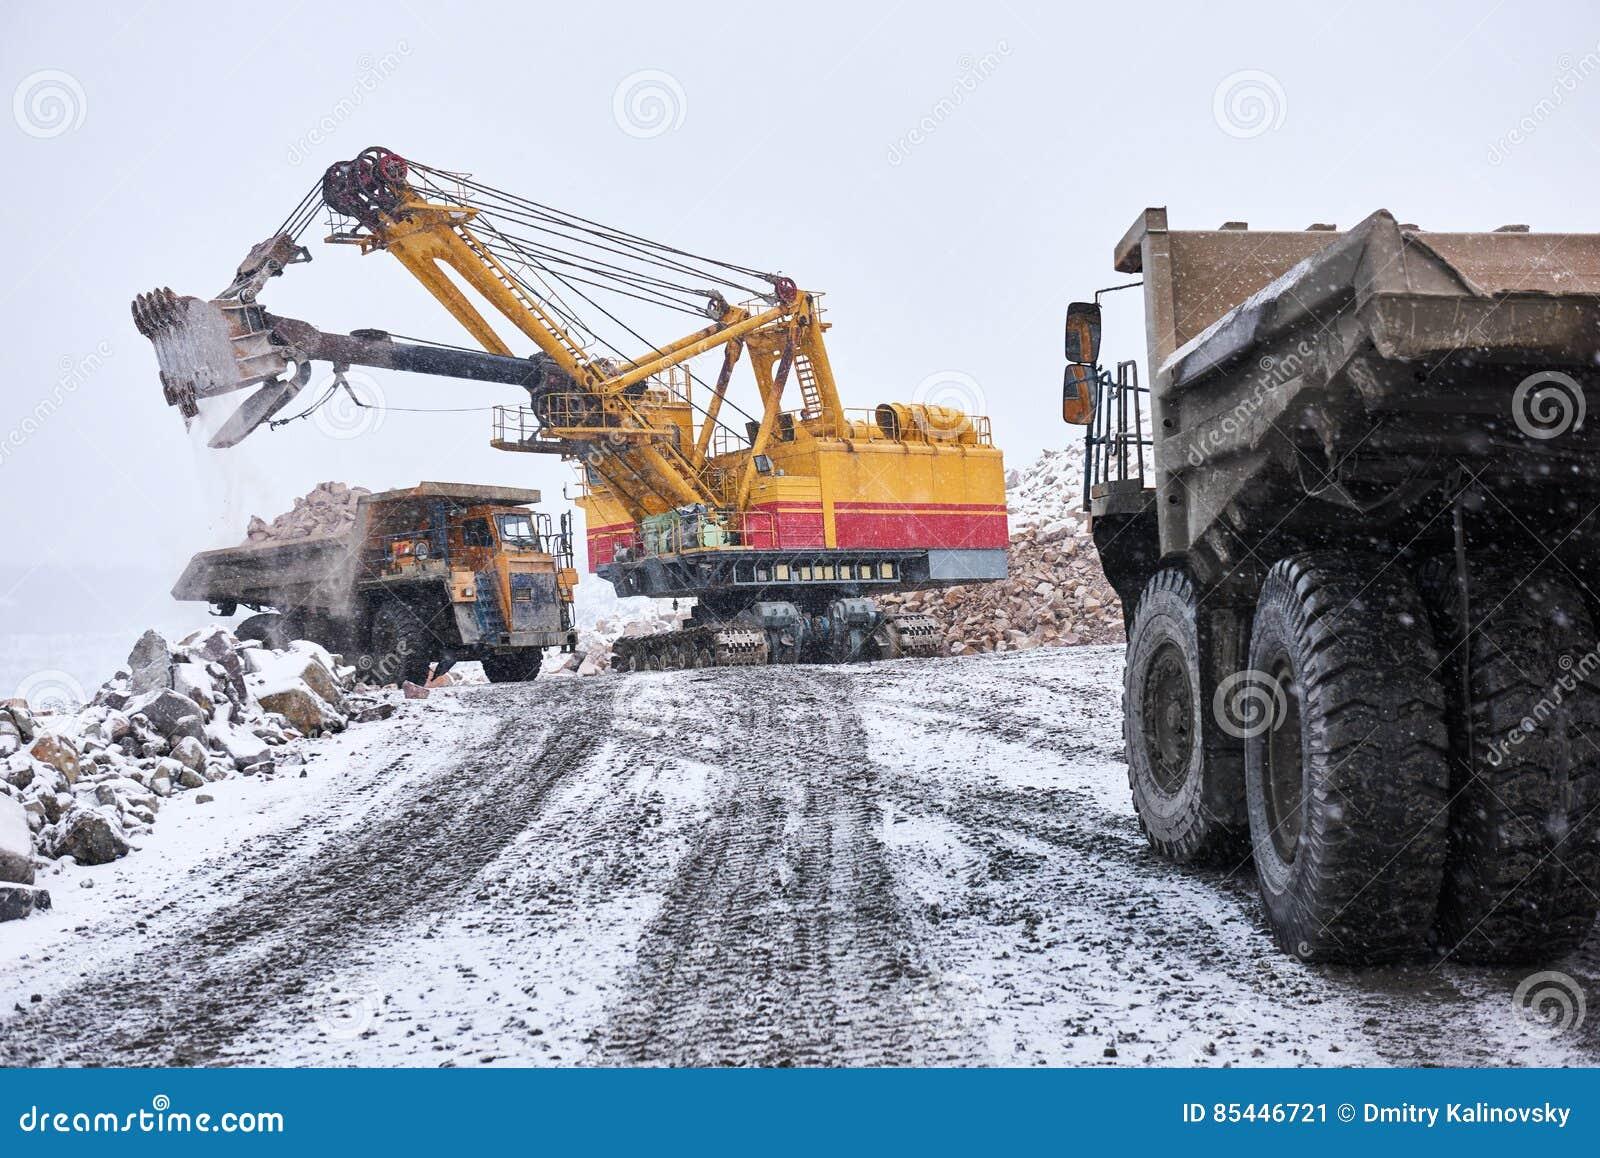 Excavator Loading Granite Or Ore Into Dump Truck At Opencast Stock Image Image Of Excavator Industrial 85446721